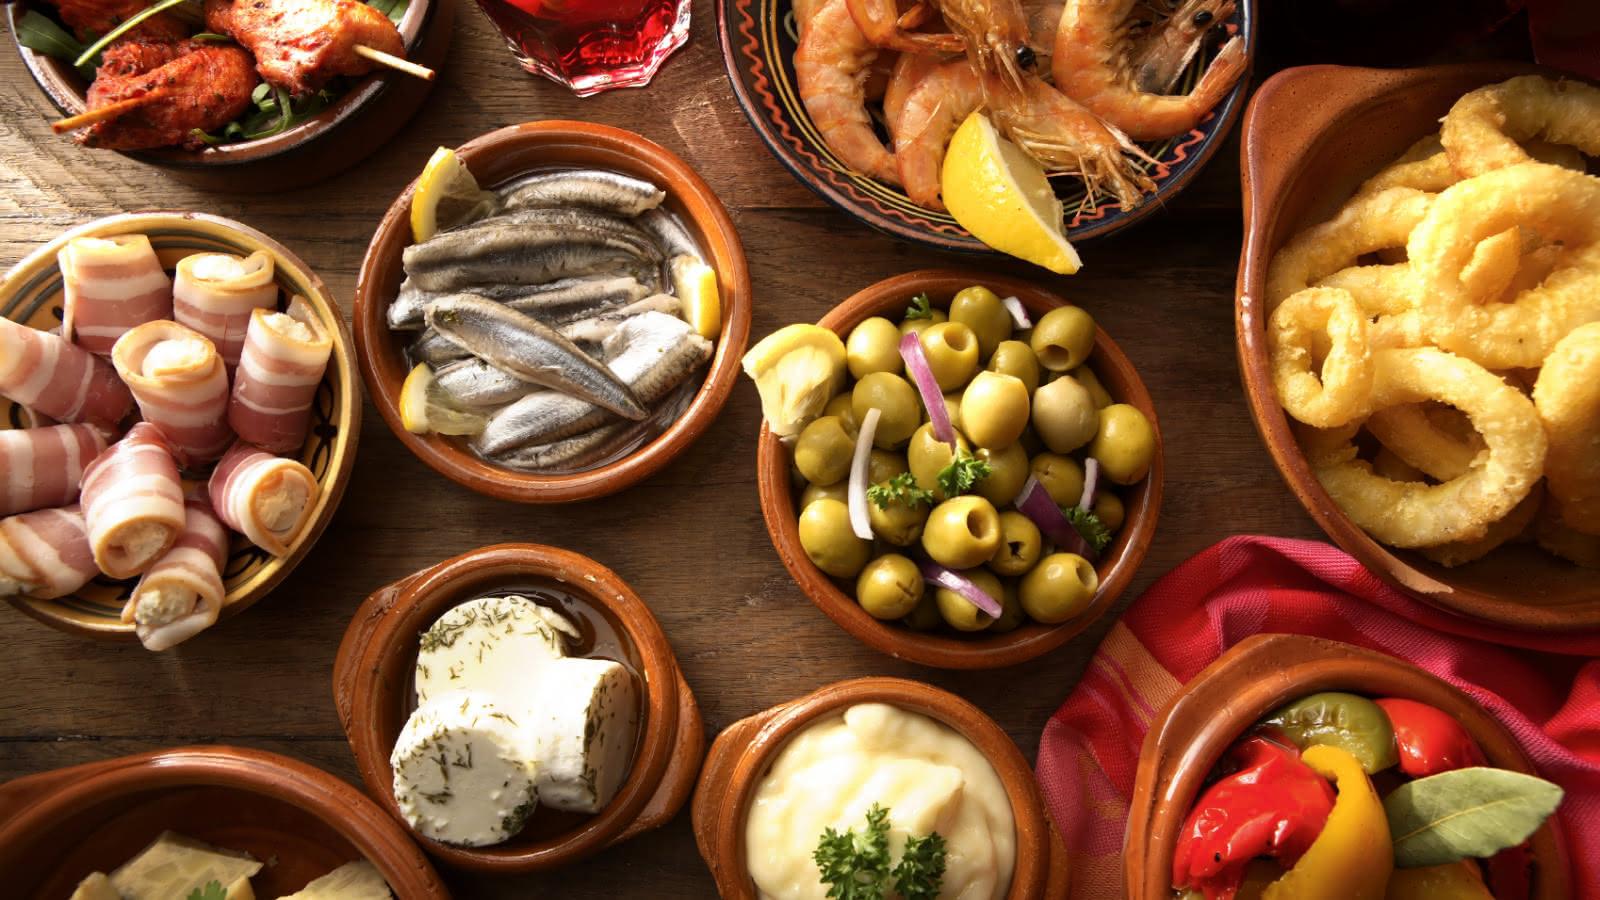 Cuisine in Marbella